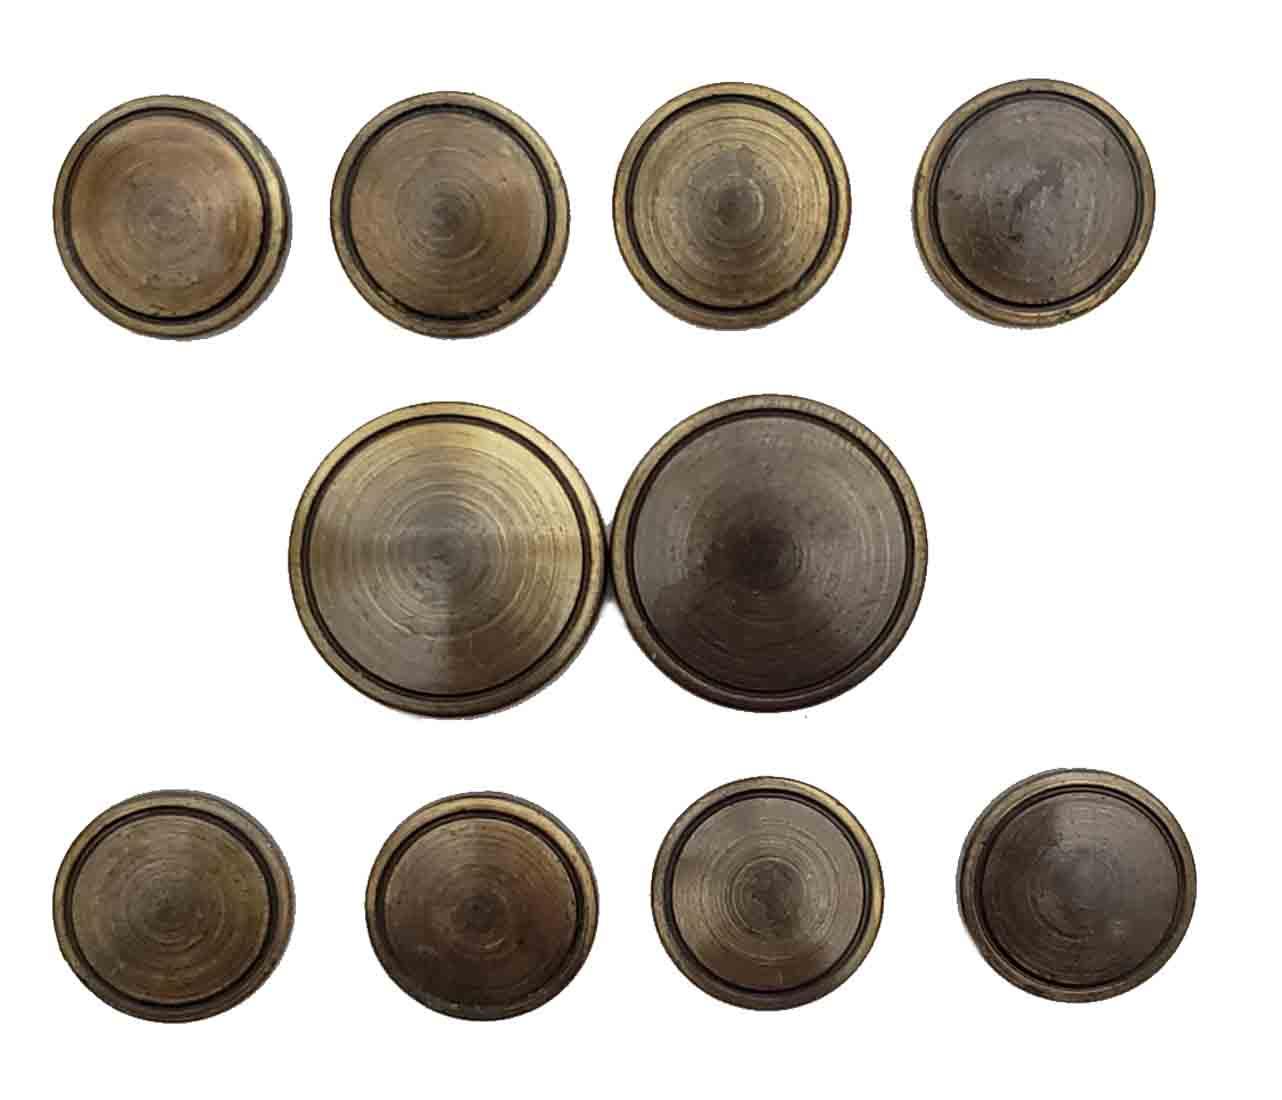 Vintage Jos A Bank Blazer Buttons Set Antique Gold Brass Shank Men's